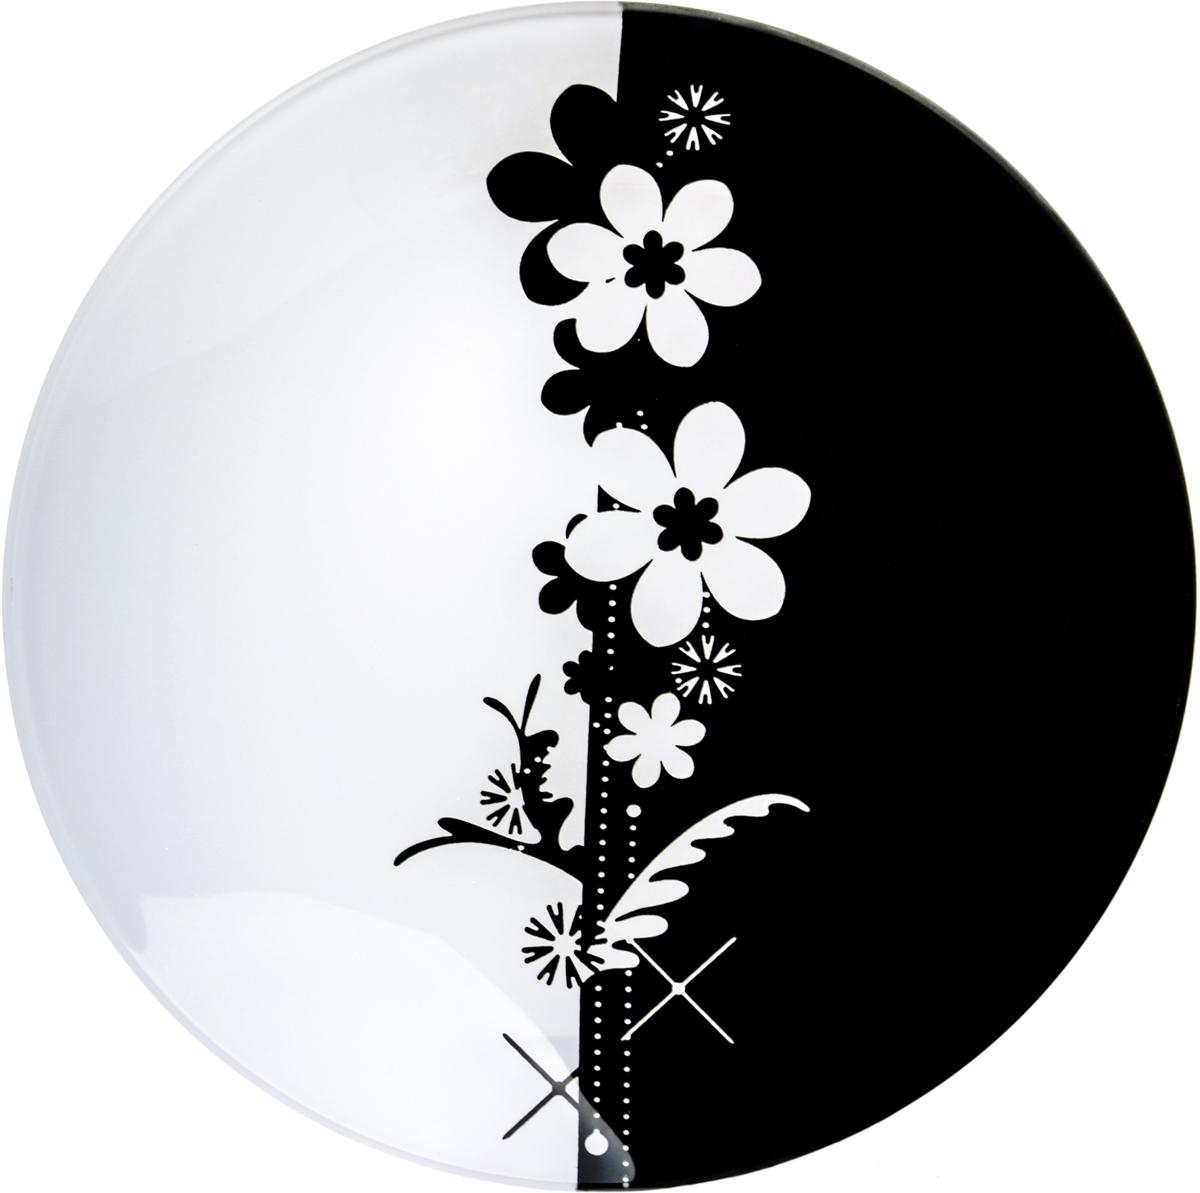 Тарелка Nina Glass Ромашки, цвет: черный, диаметр 14 см салатник nina glass ажур цвет сиреневый диаметр 16 см